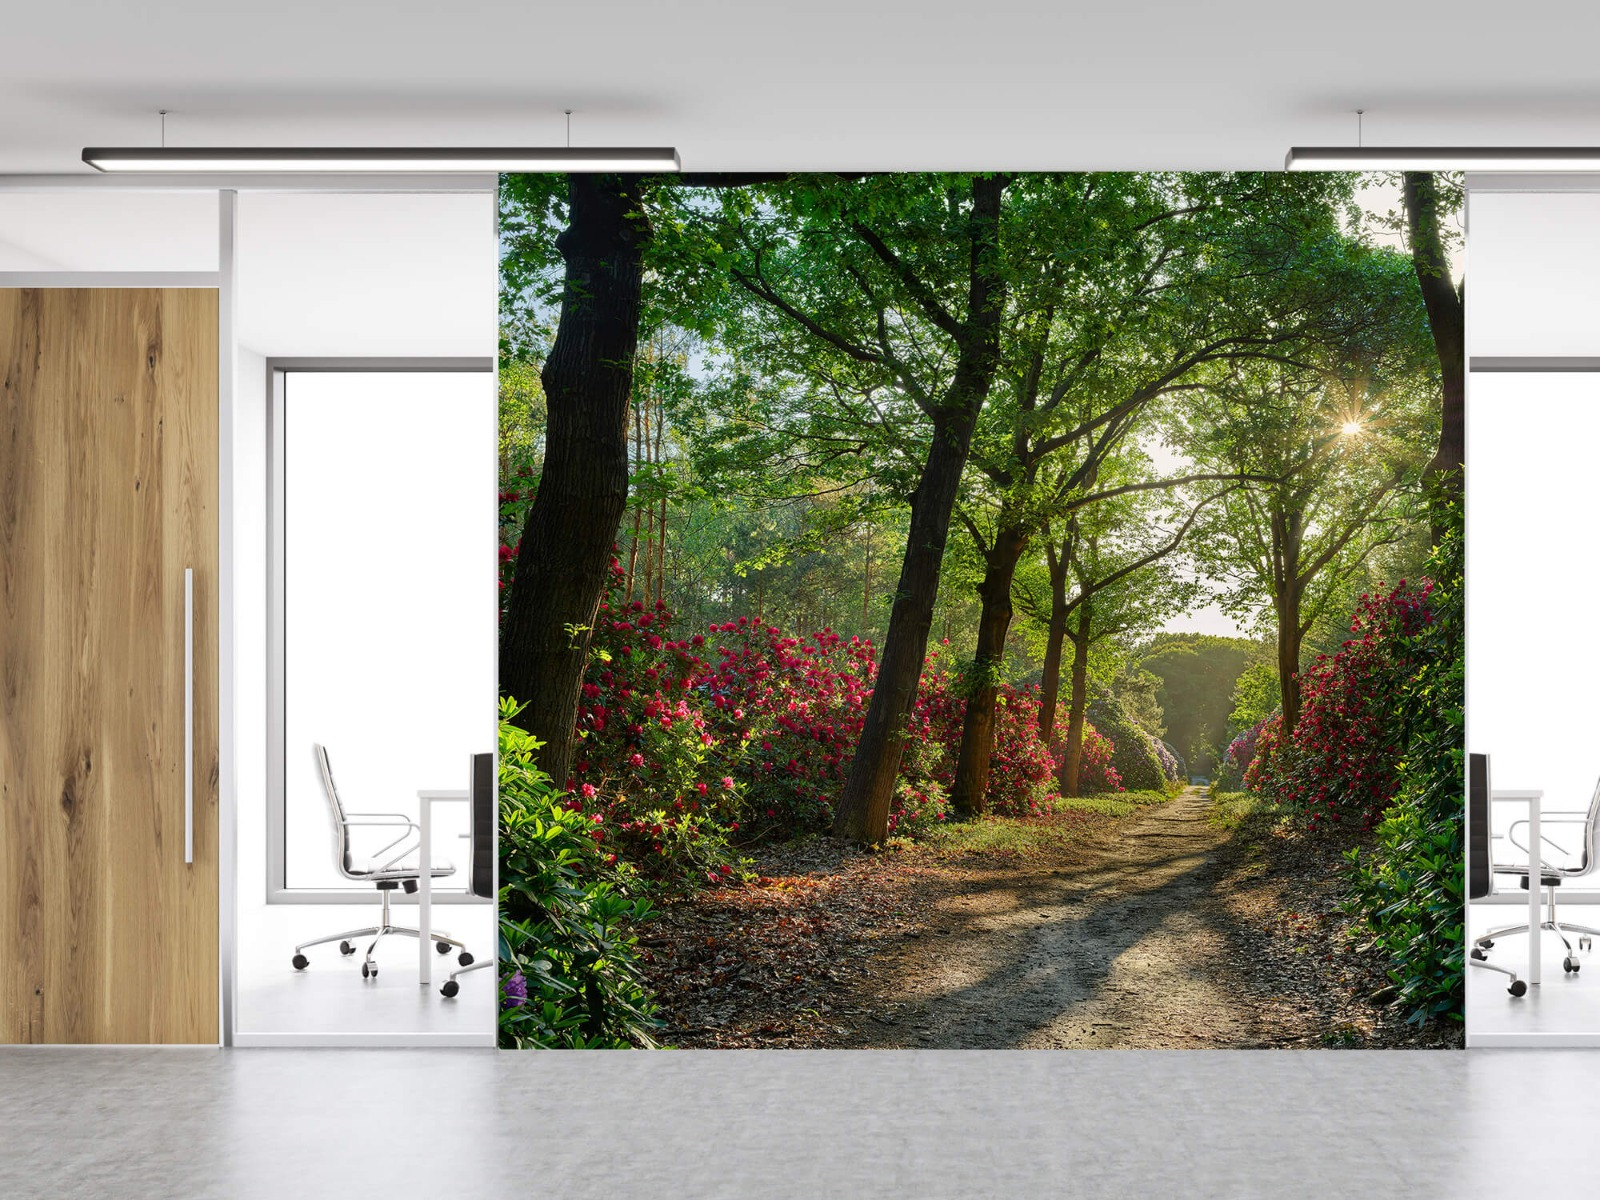 Bos - Zonsopkomst bij pad met rhododendrons 2